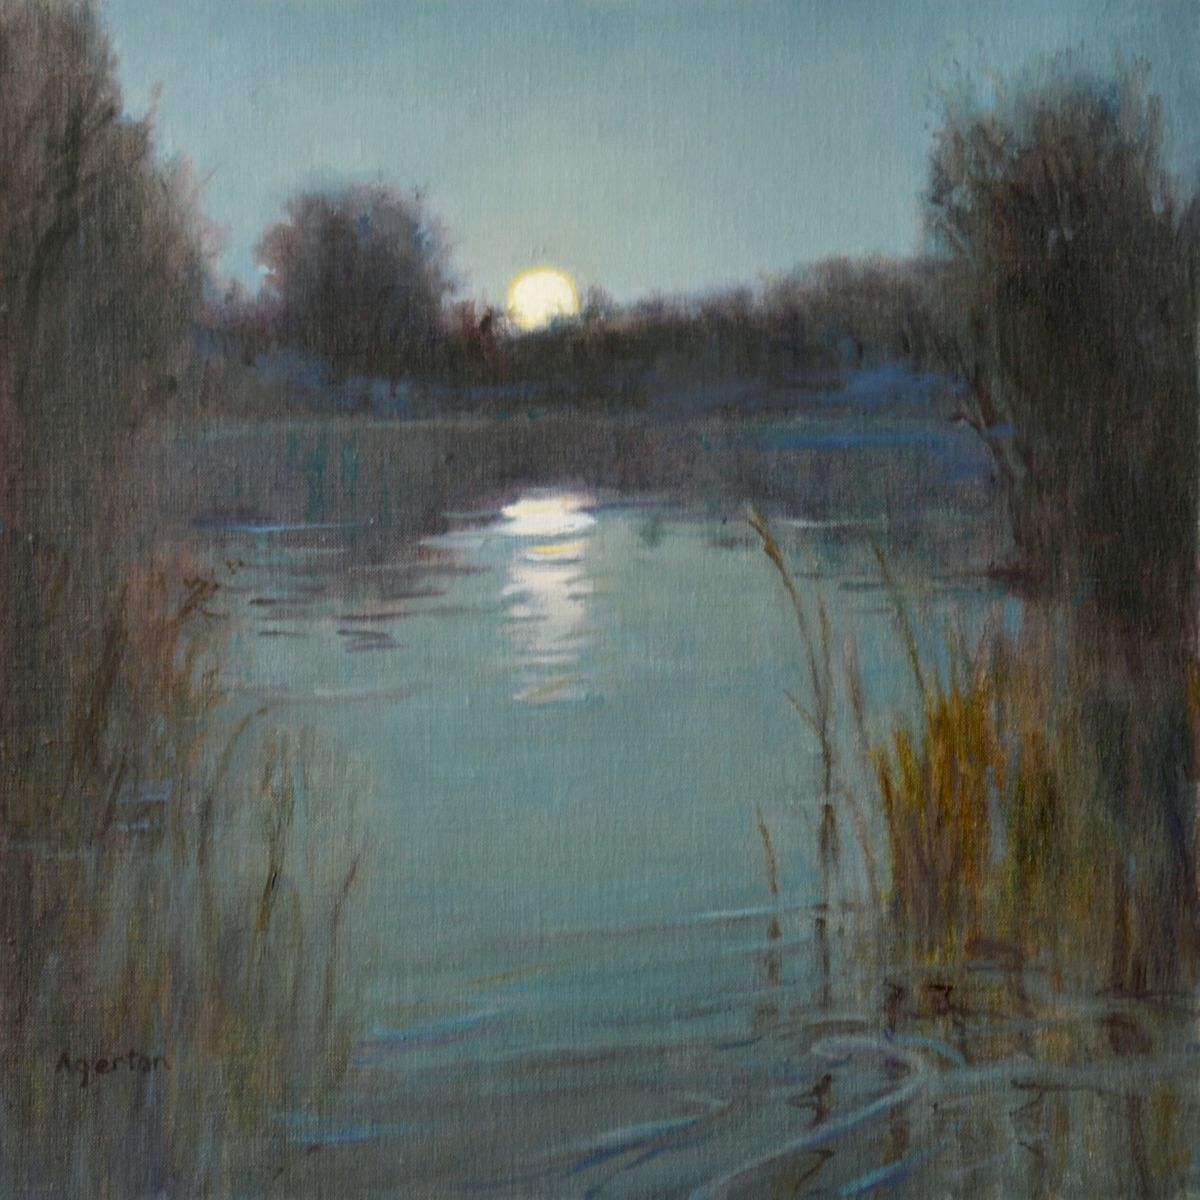 Agerton, Mallory_Rising Moon, 12 x 12.jpg